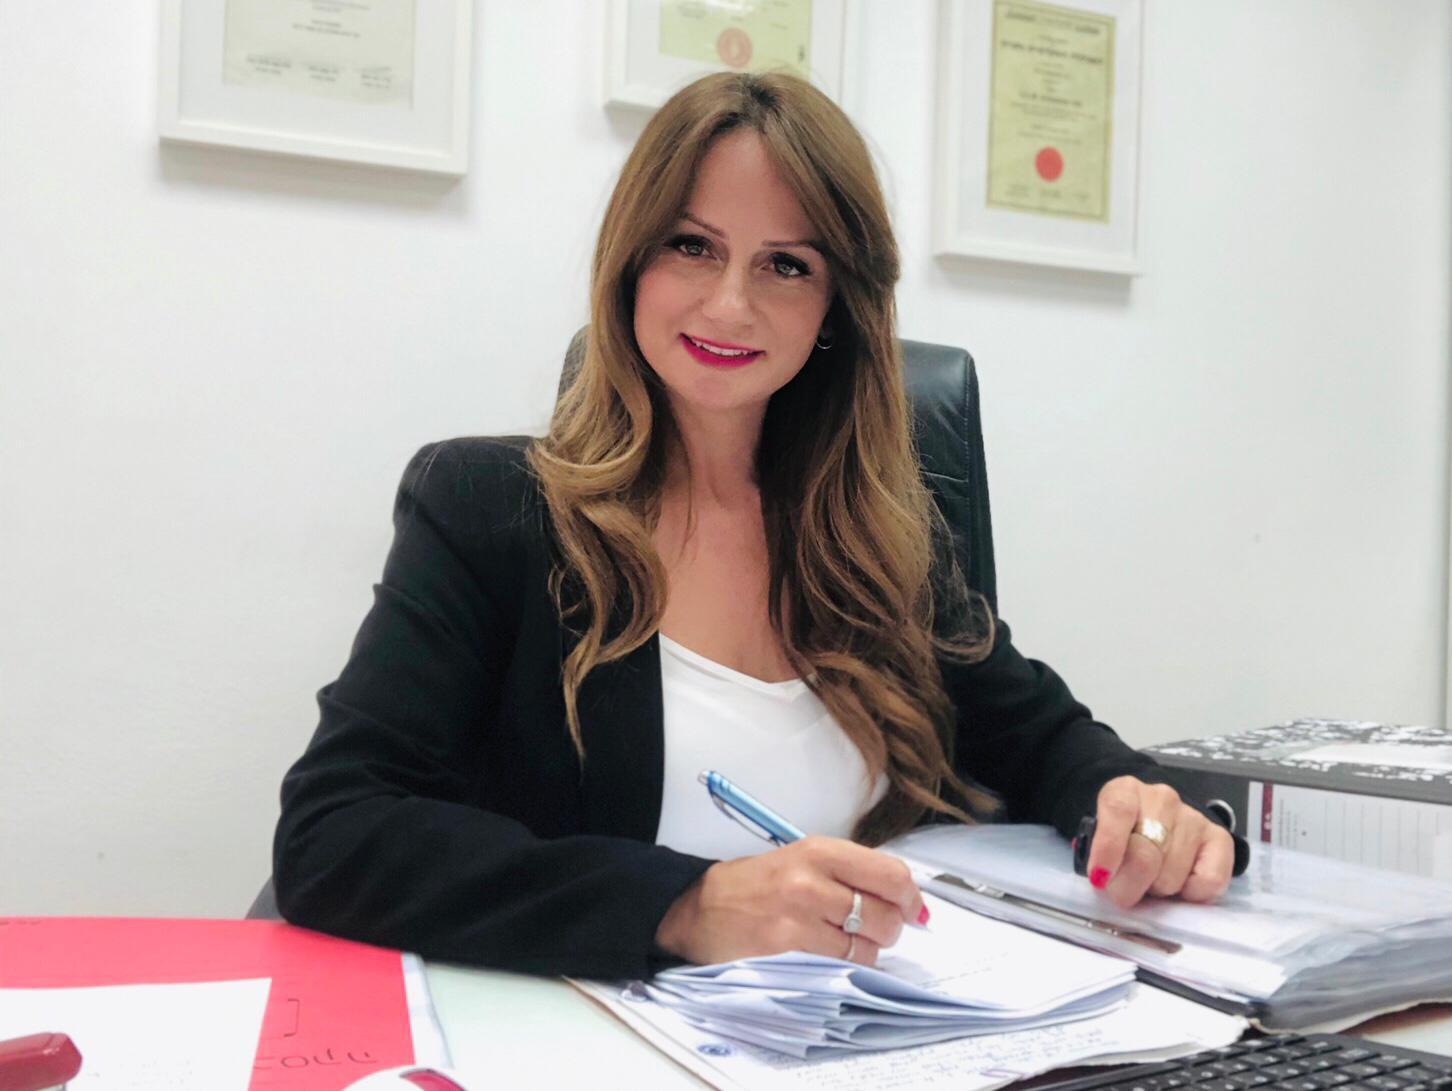 Мири Нахшонов